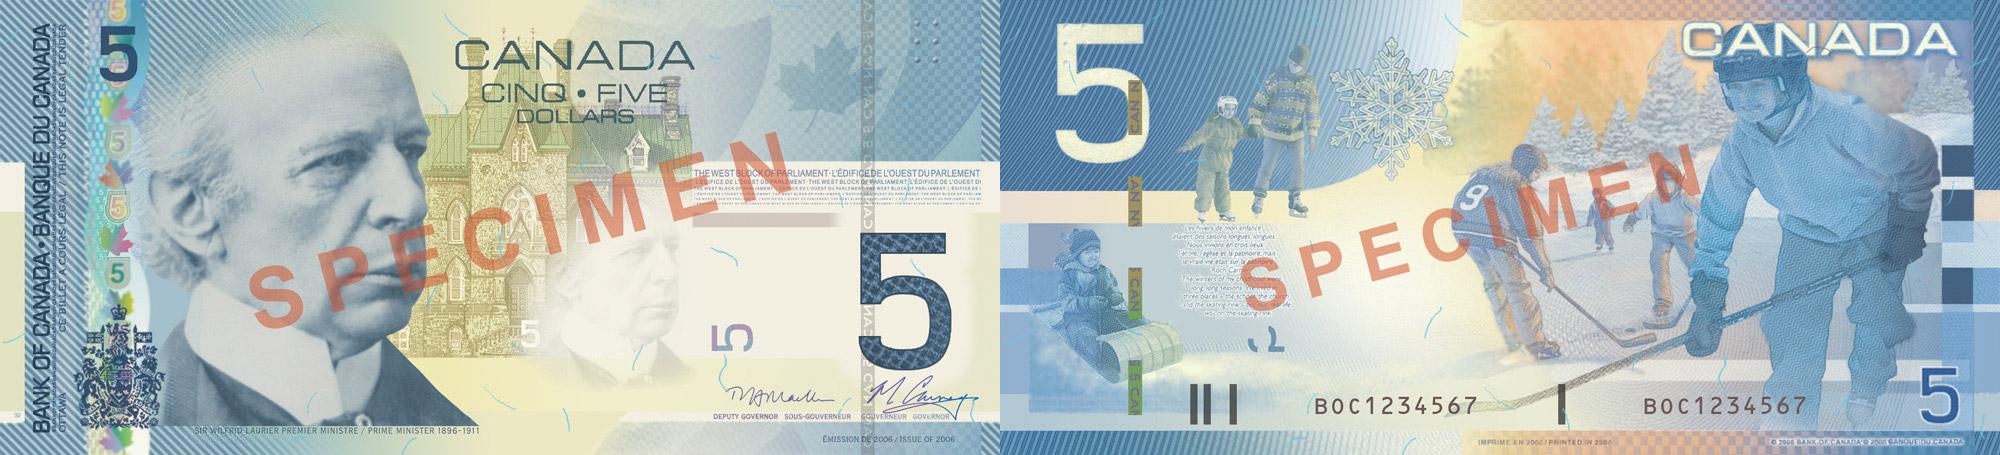 5 dollars 2004-2006 - Canada Banknote